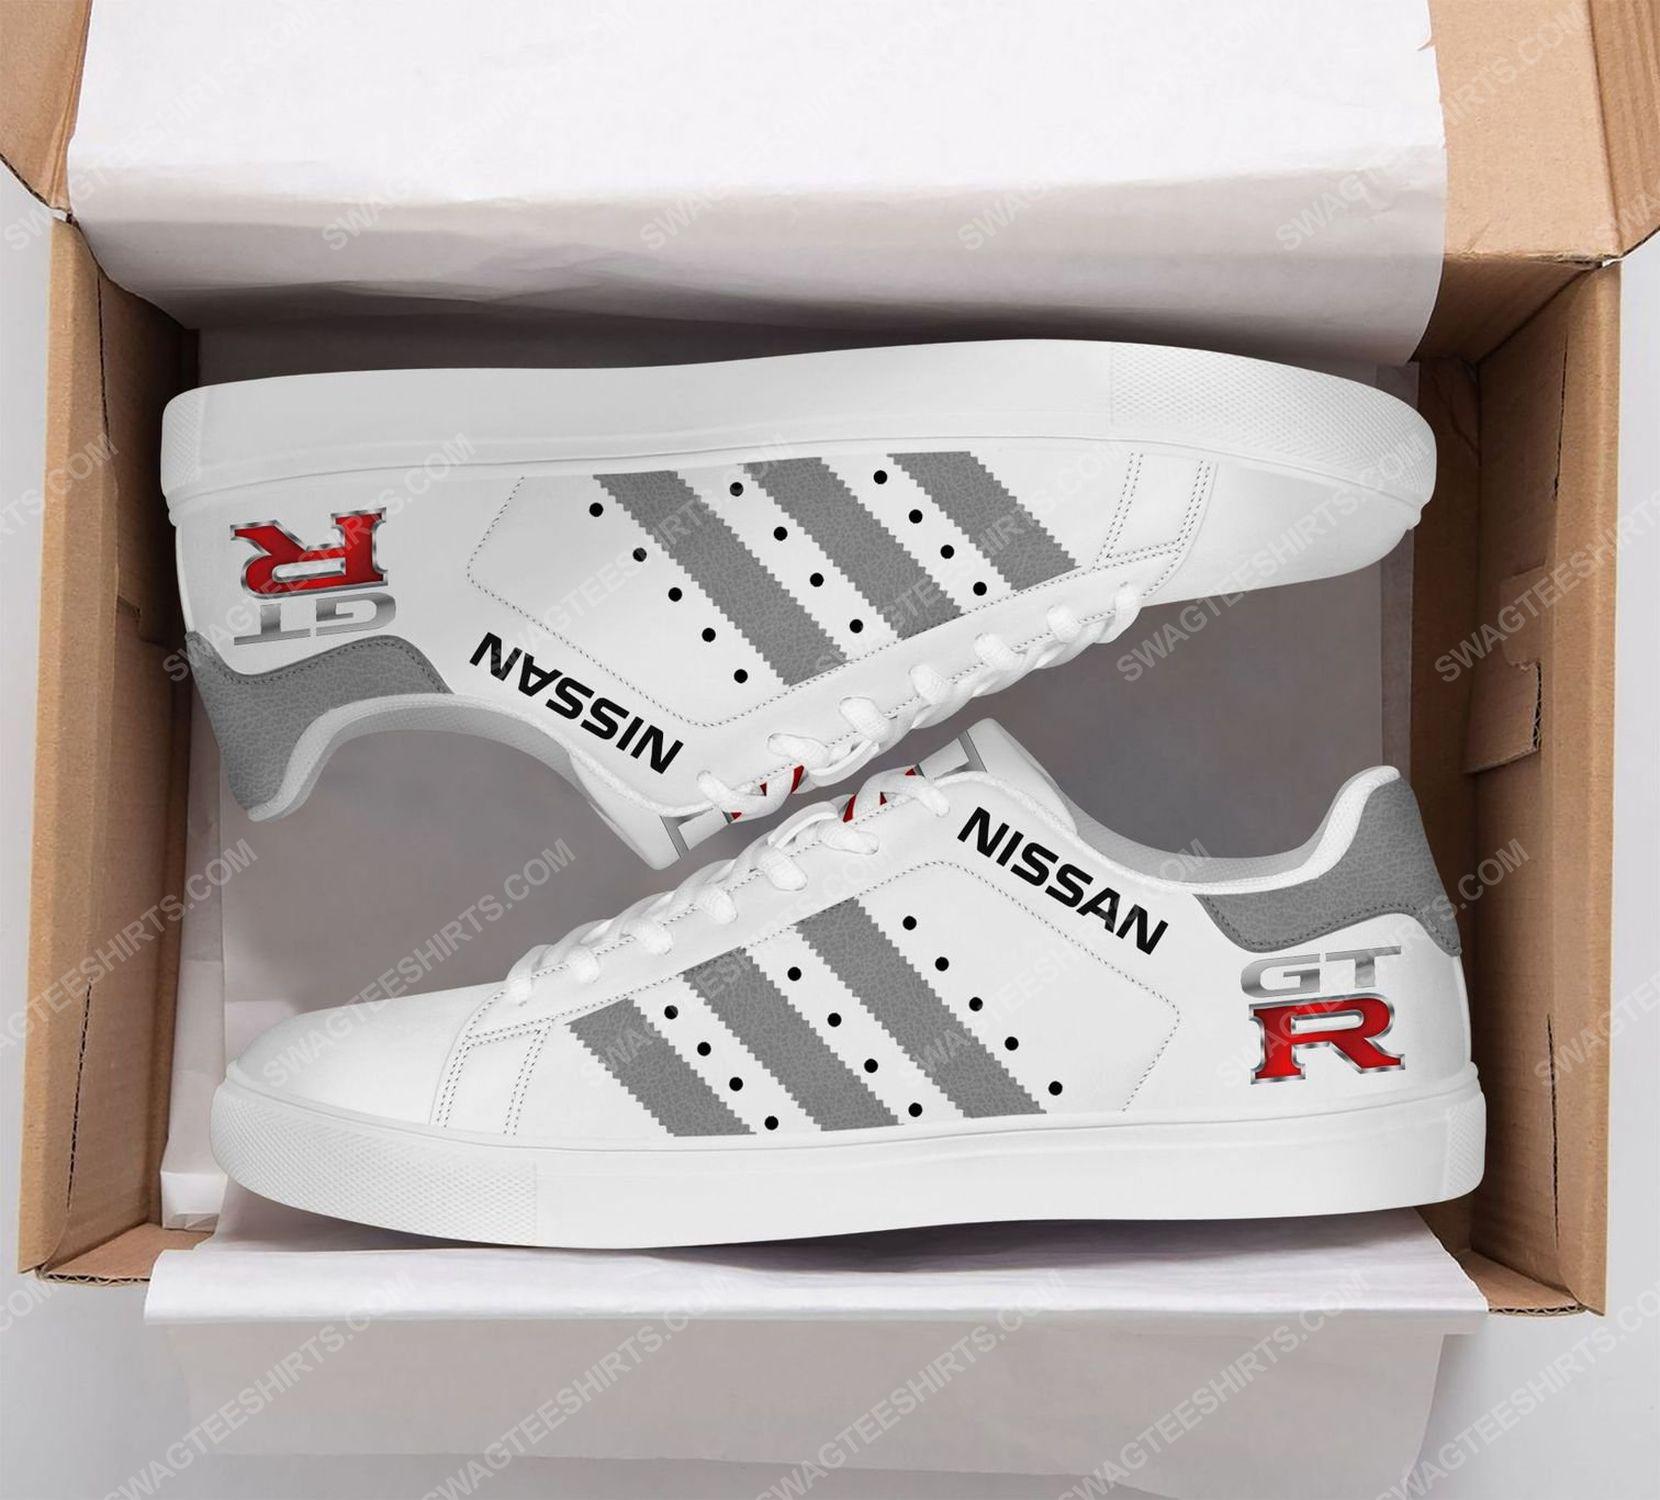 Nissan motorsport version grey stan smith shoes 2